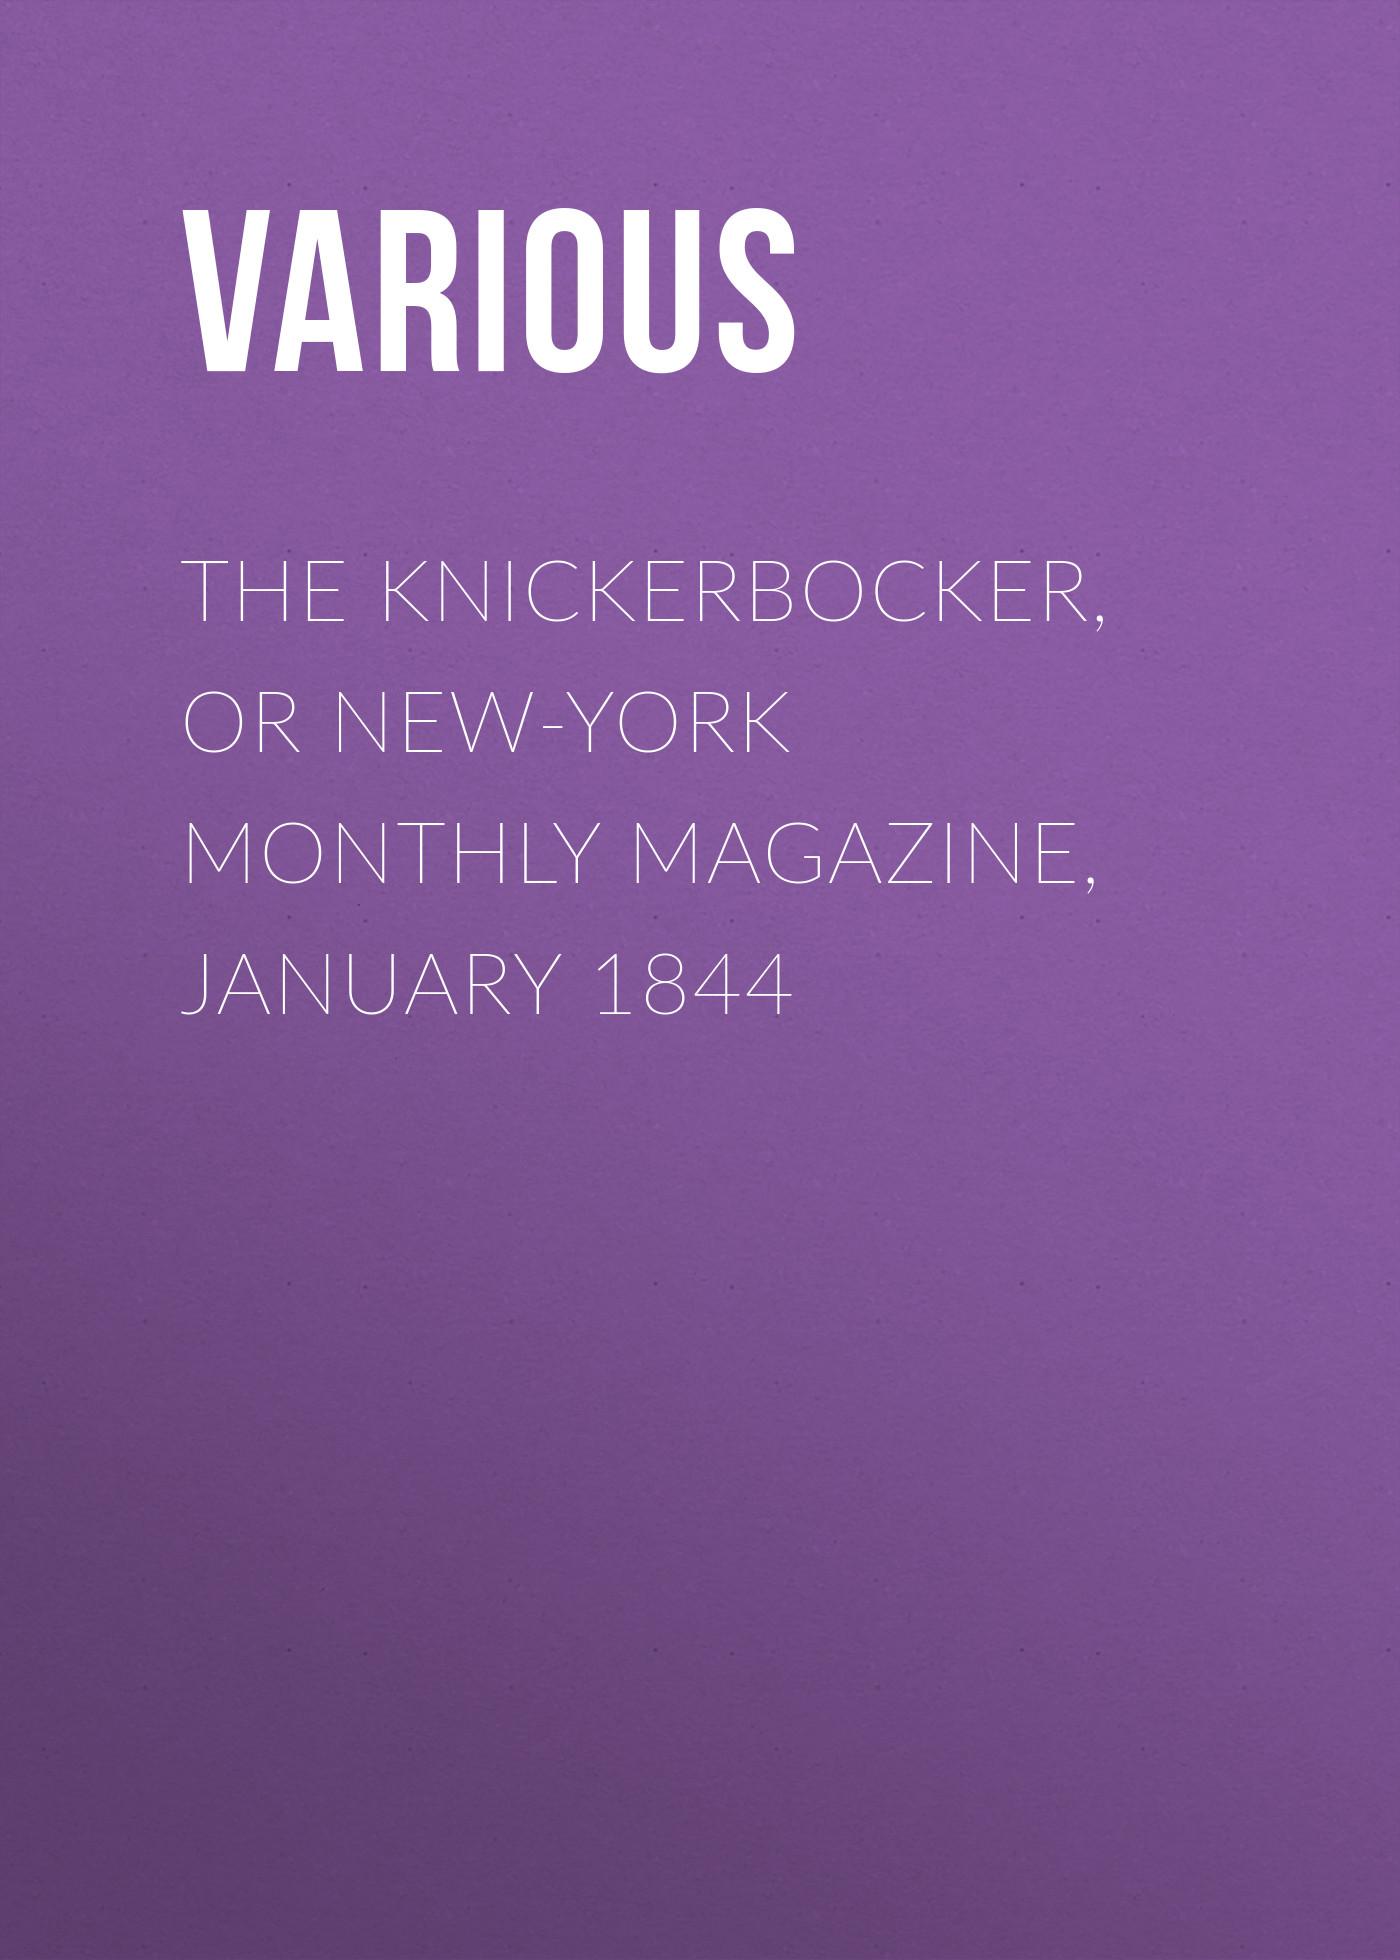 Various The Knickerbocker, or New-York Monthly Magazine, January 1844 maura jacobson new york magazine crosswords volume 7